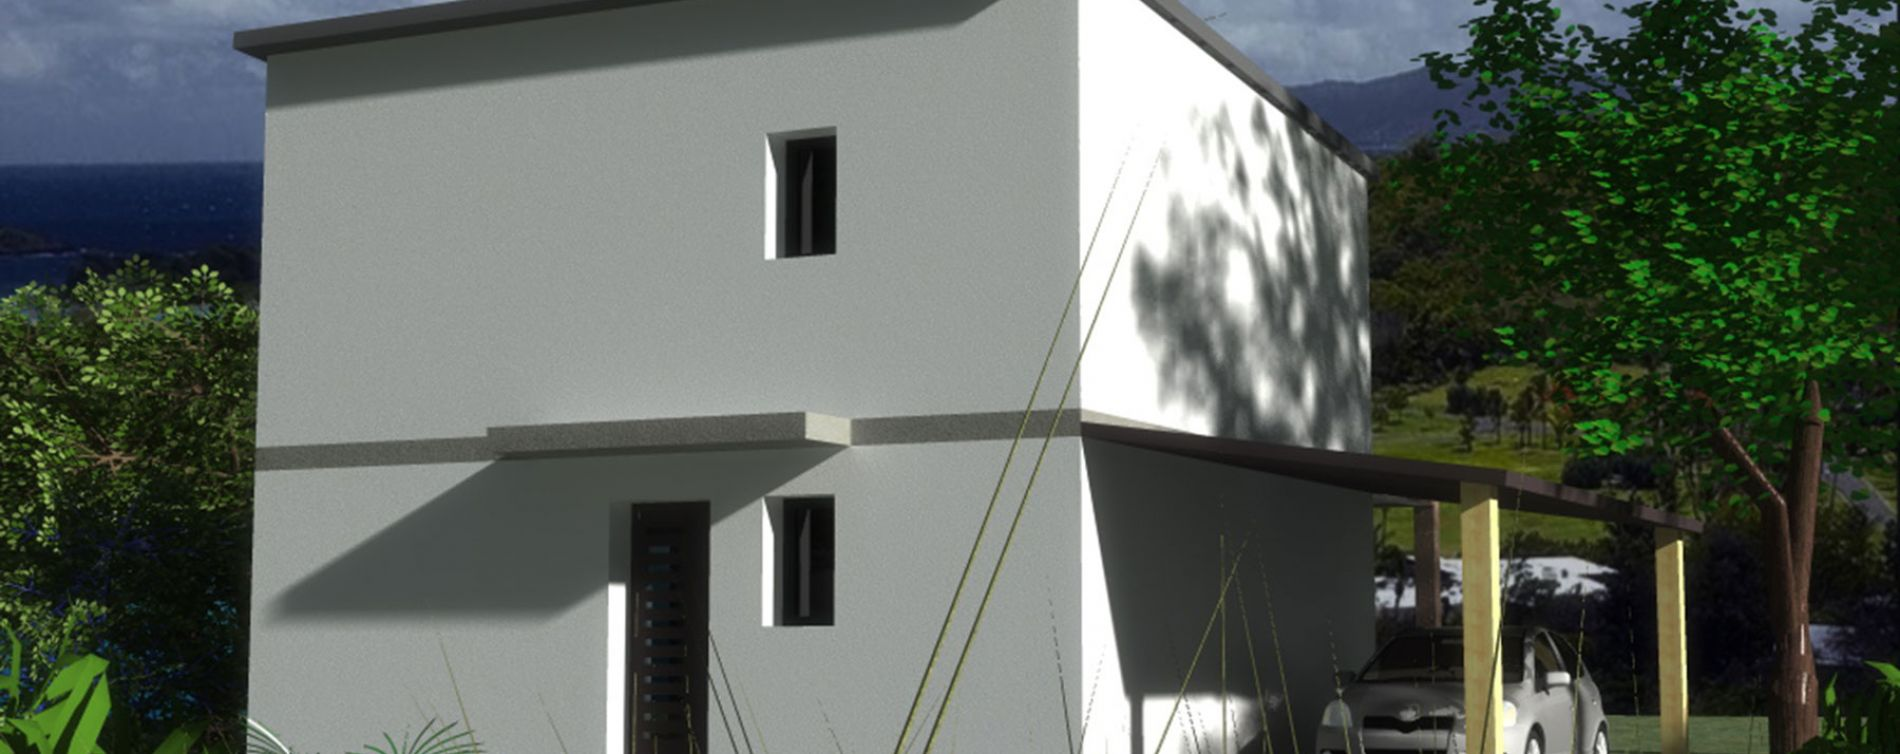 Lesneven : programme immobilier neuve « Pen Ar C'Hoat » (5)